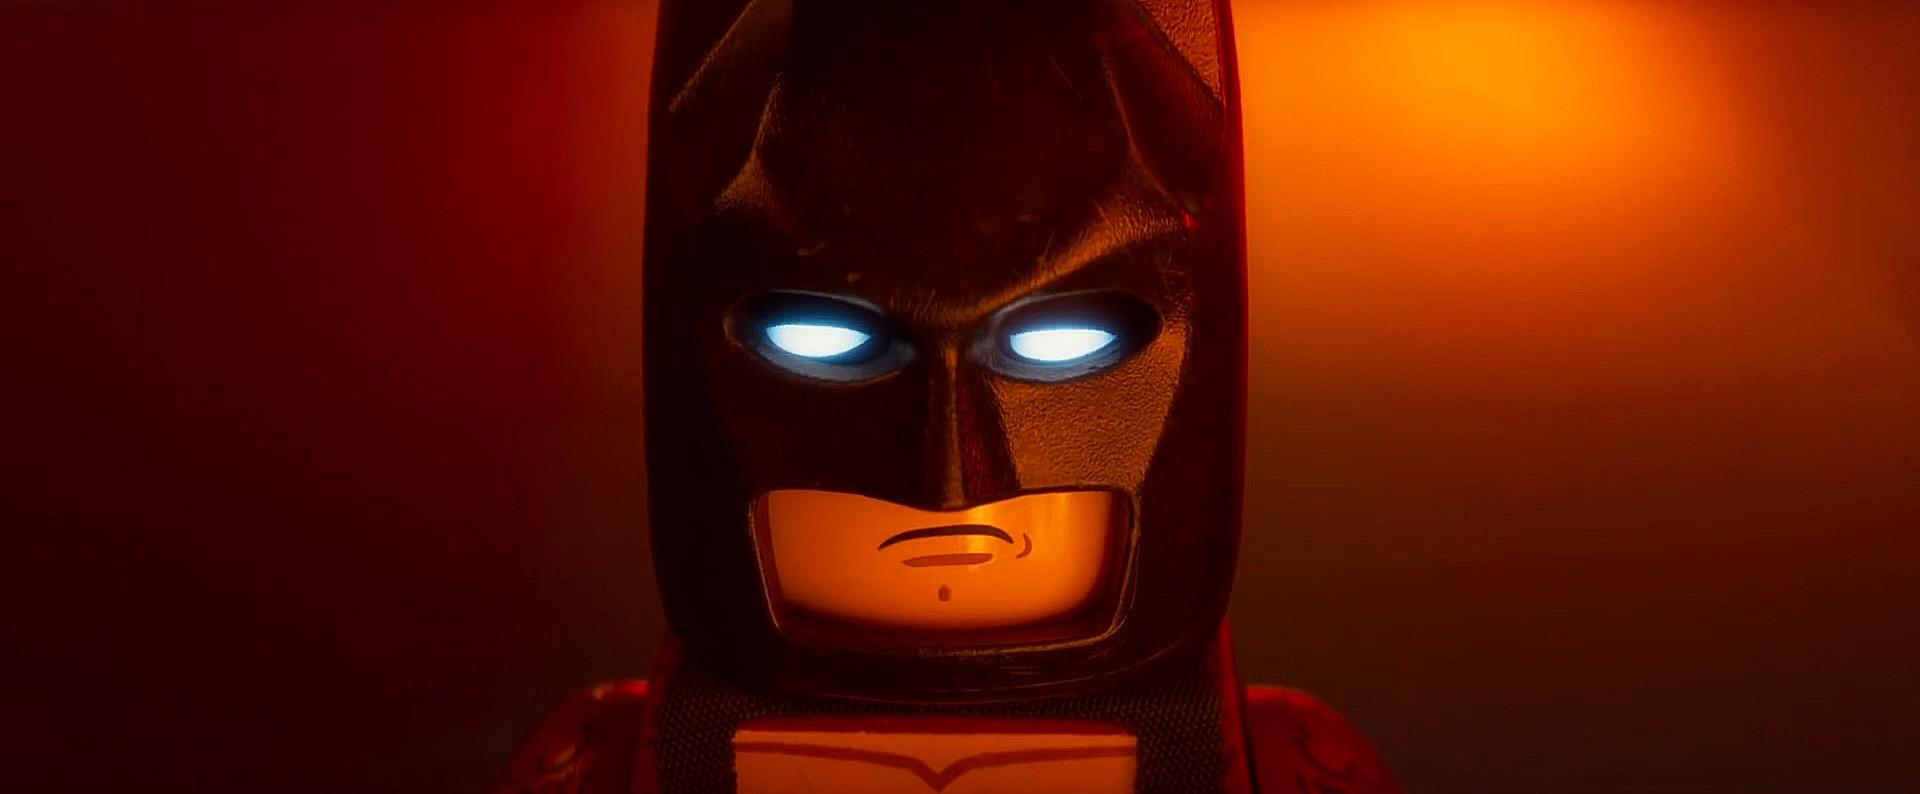 The Lego Batman Animation Movie Wallpaper 33 1920x794